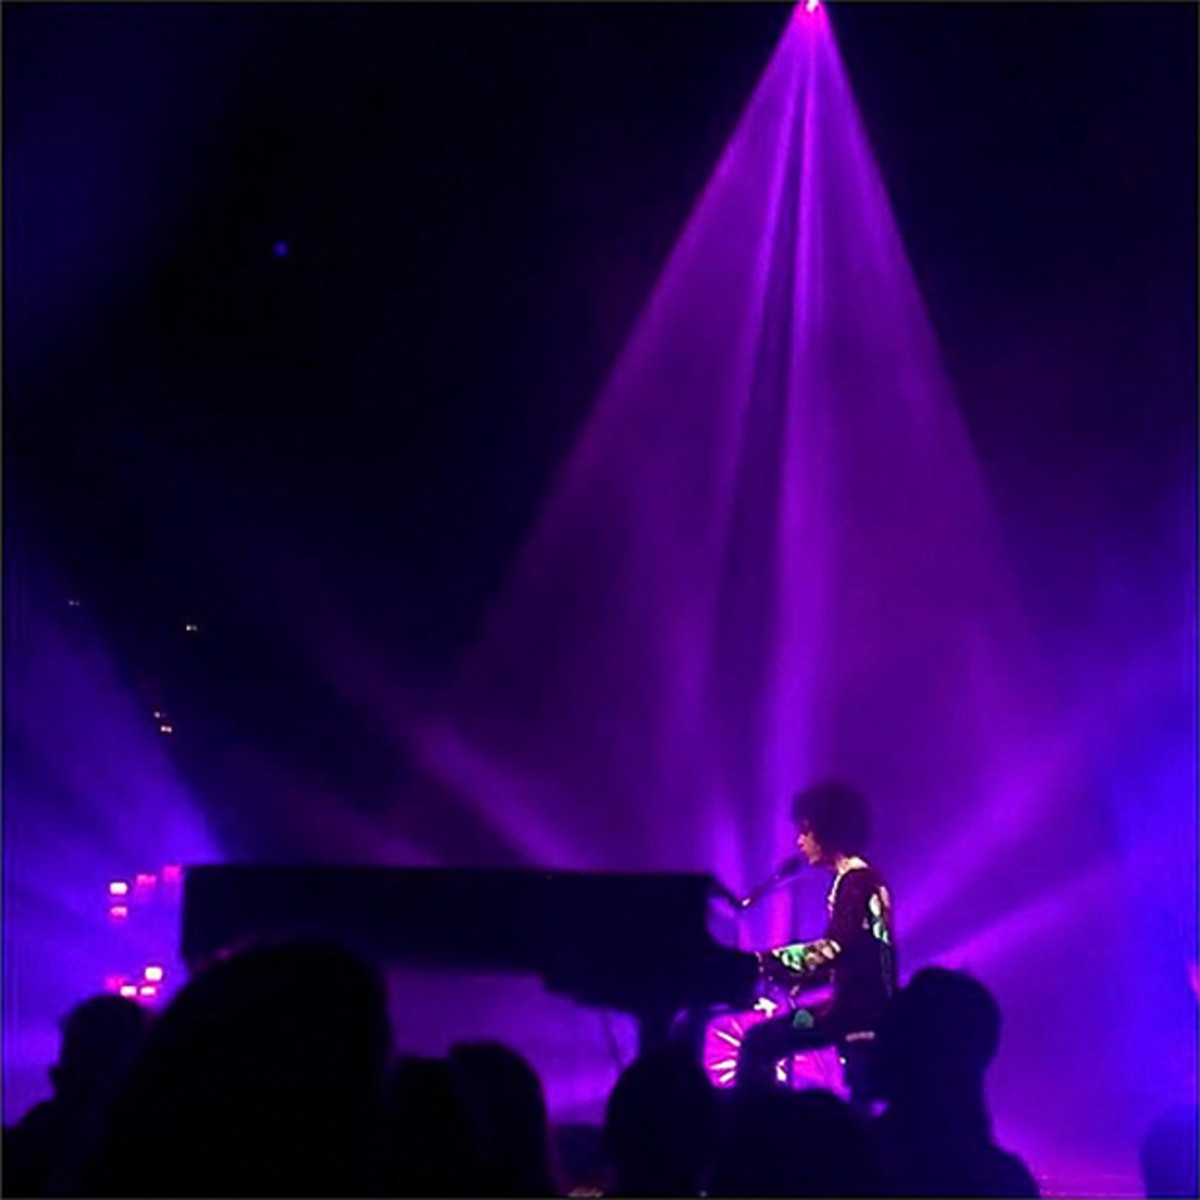 Prince (image via Instagram)